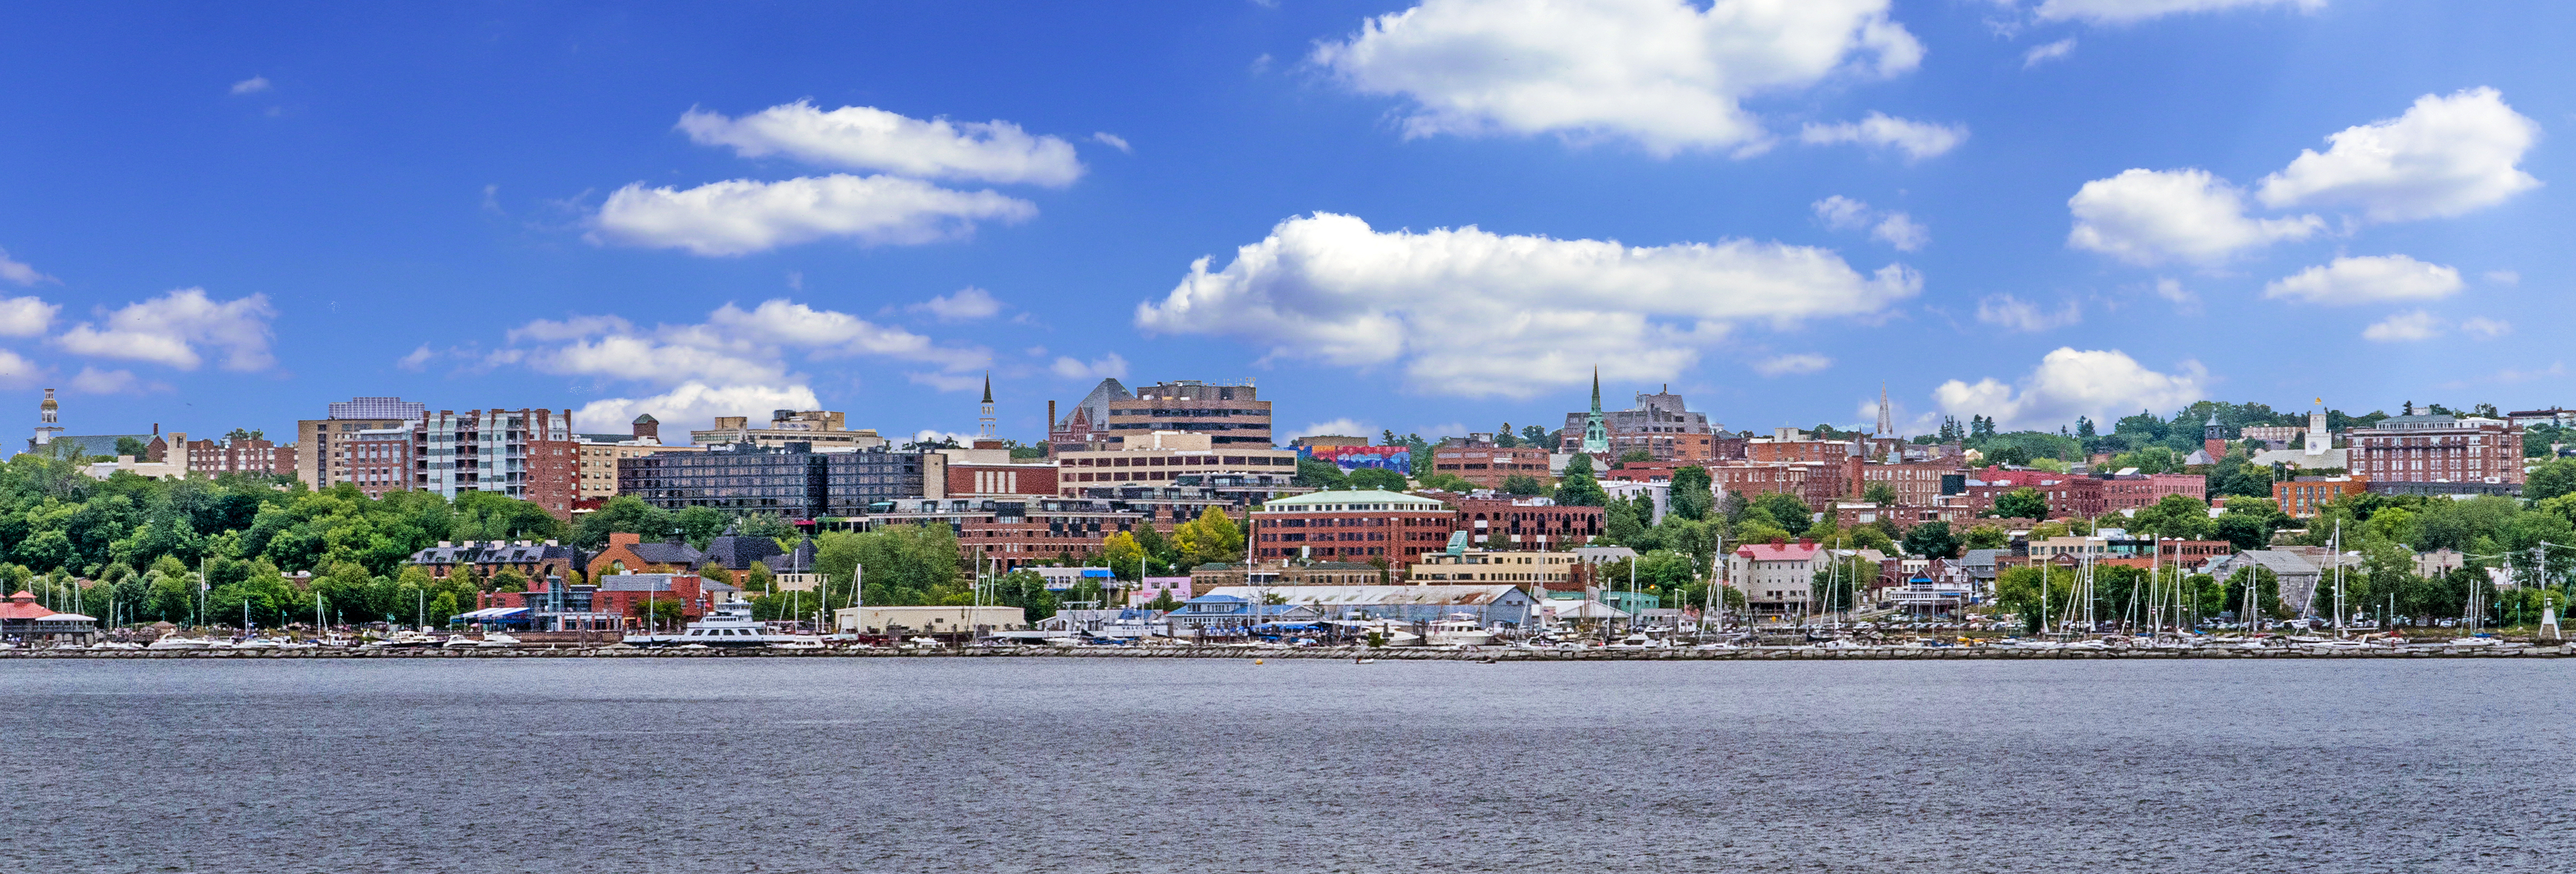 City of Burlington waterfront from Lake Champlain